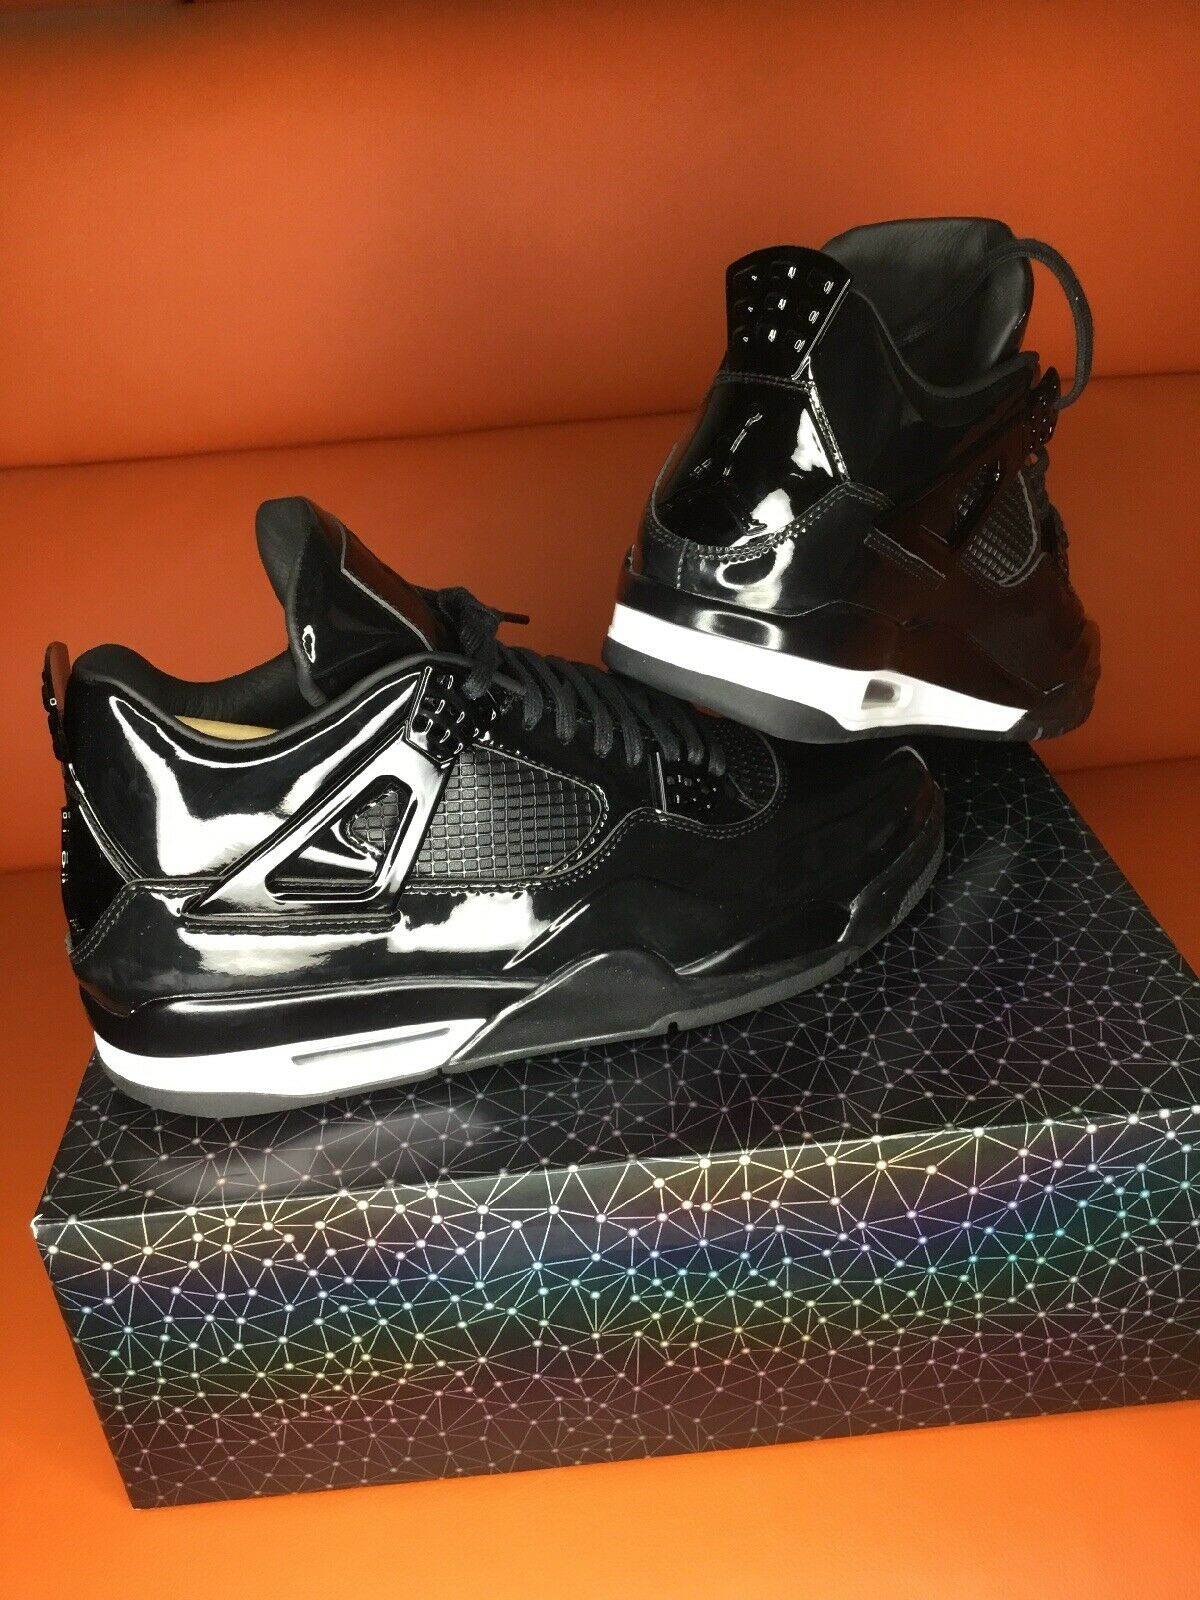 NIKE AIR Jordan 11Lab4 Black Patent  Leather DS Receipt SZ 10.5 Retail  250